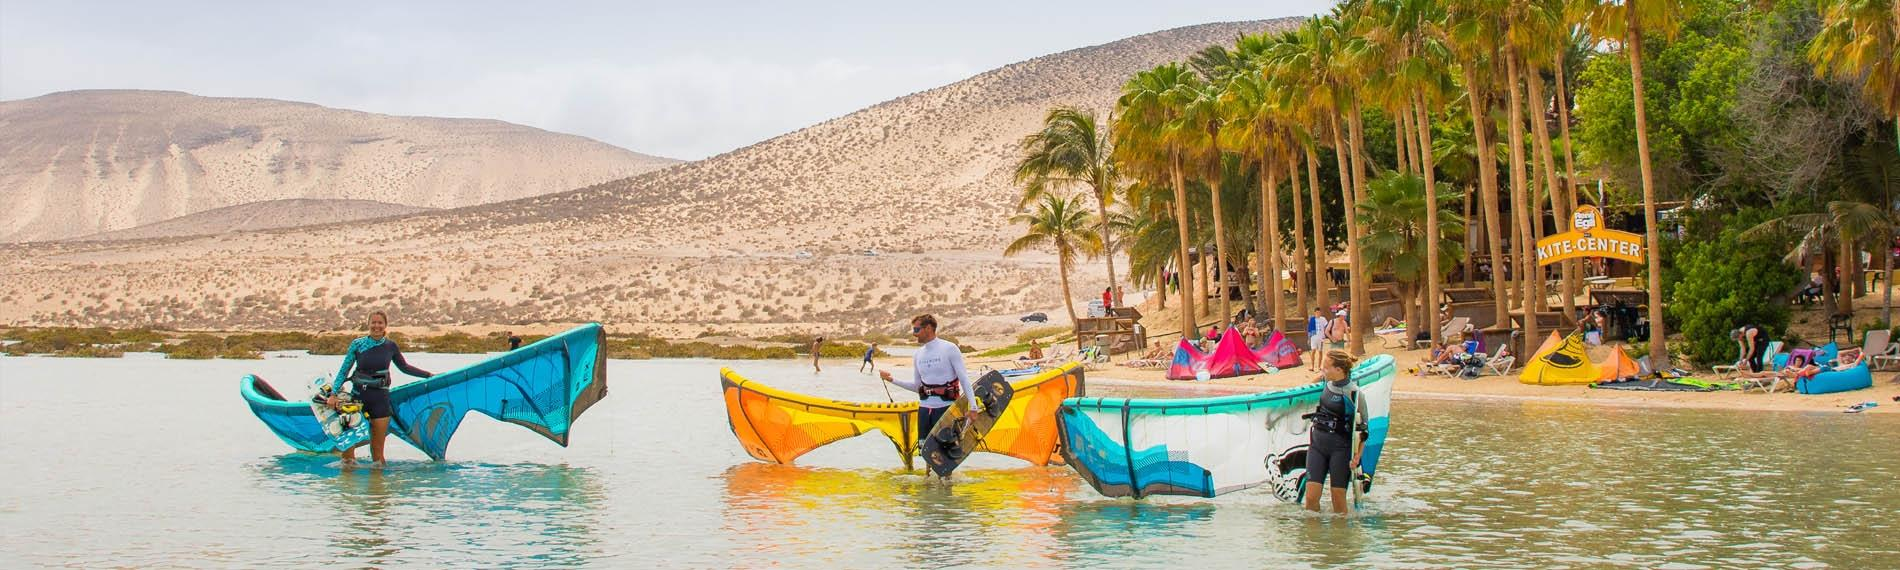 Fuerteventura - Sotavento